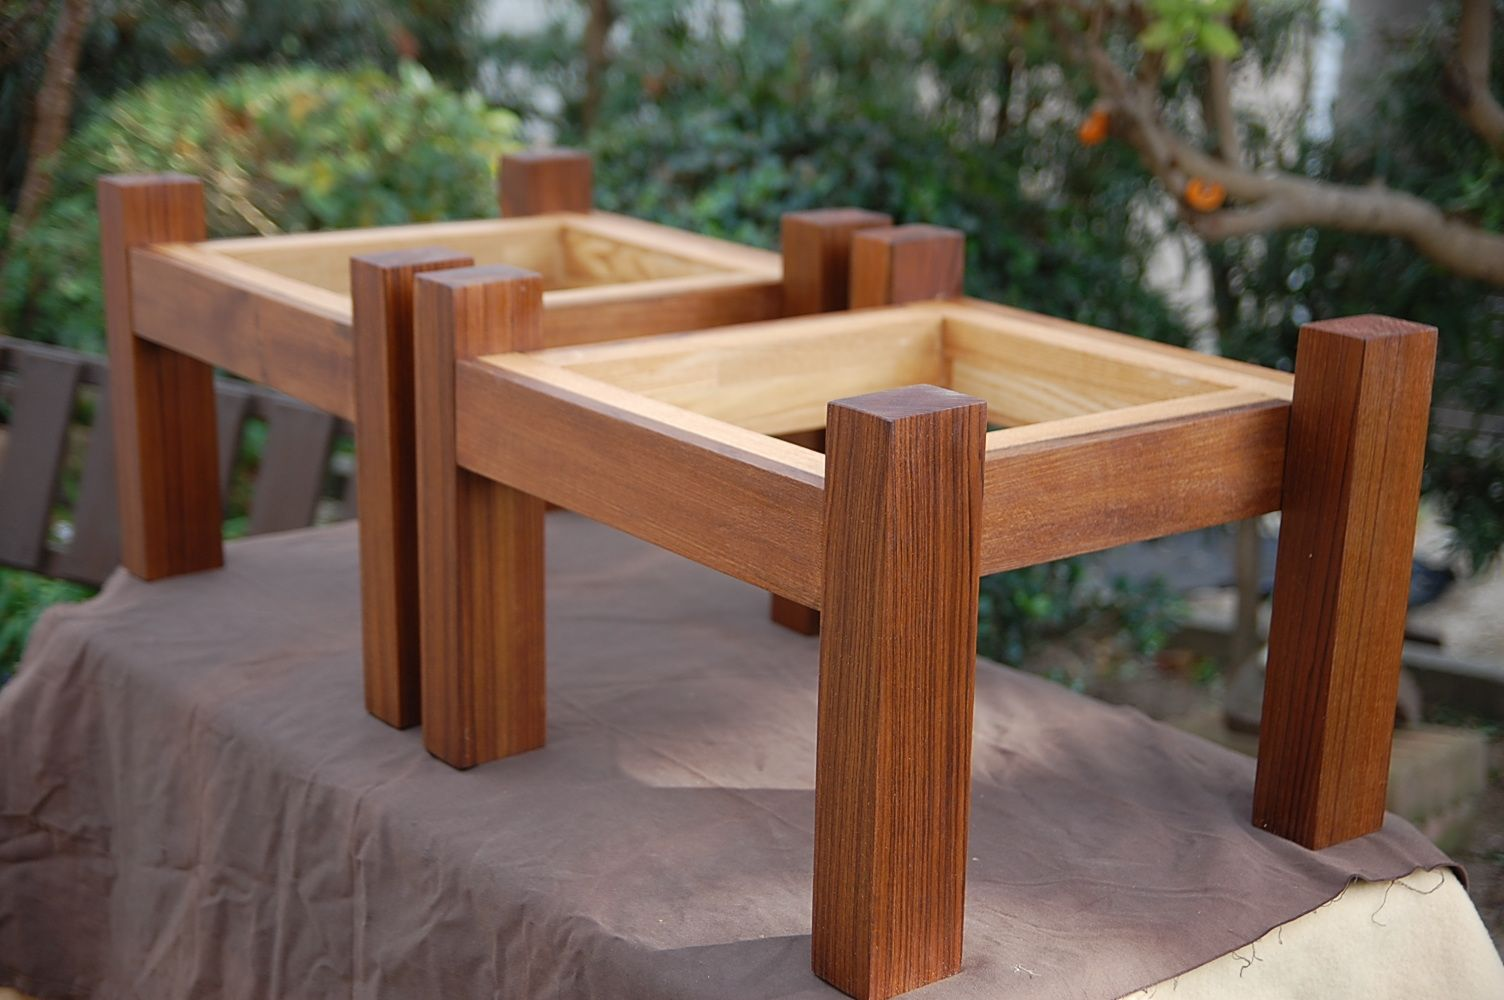 Spendor Metal Badges Google Search Outdoor Furniture